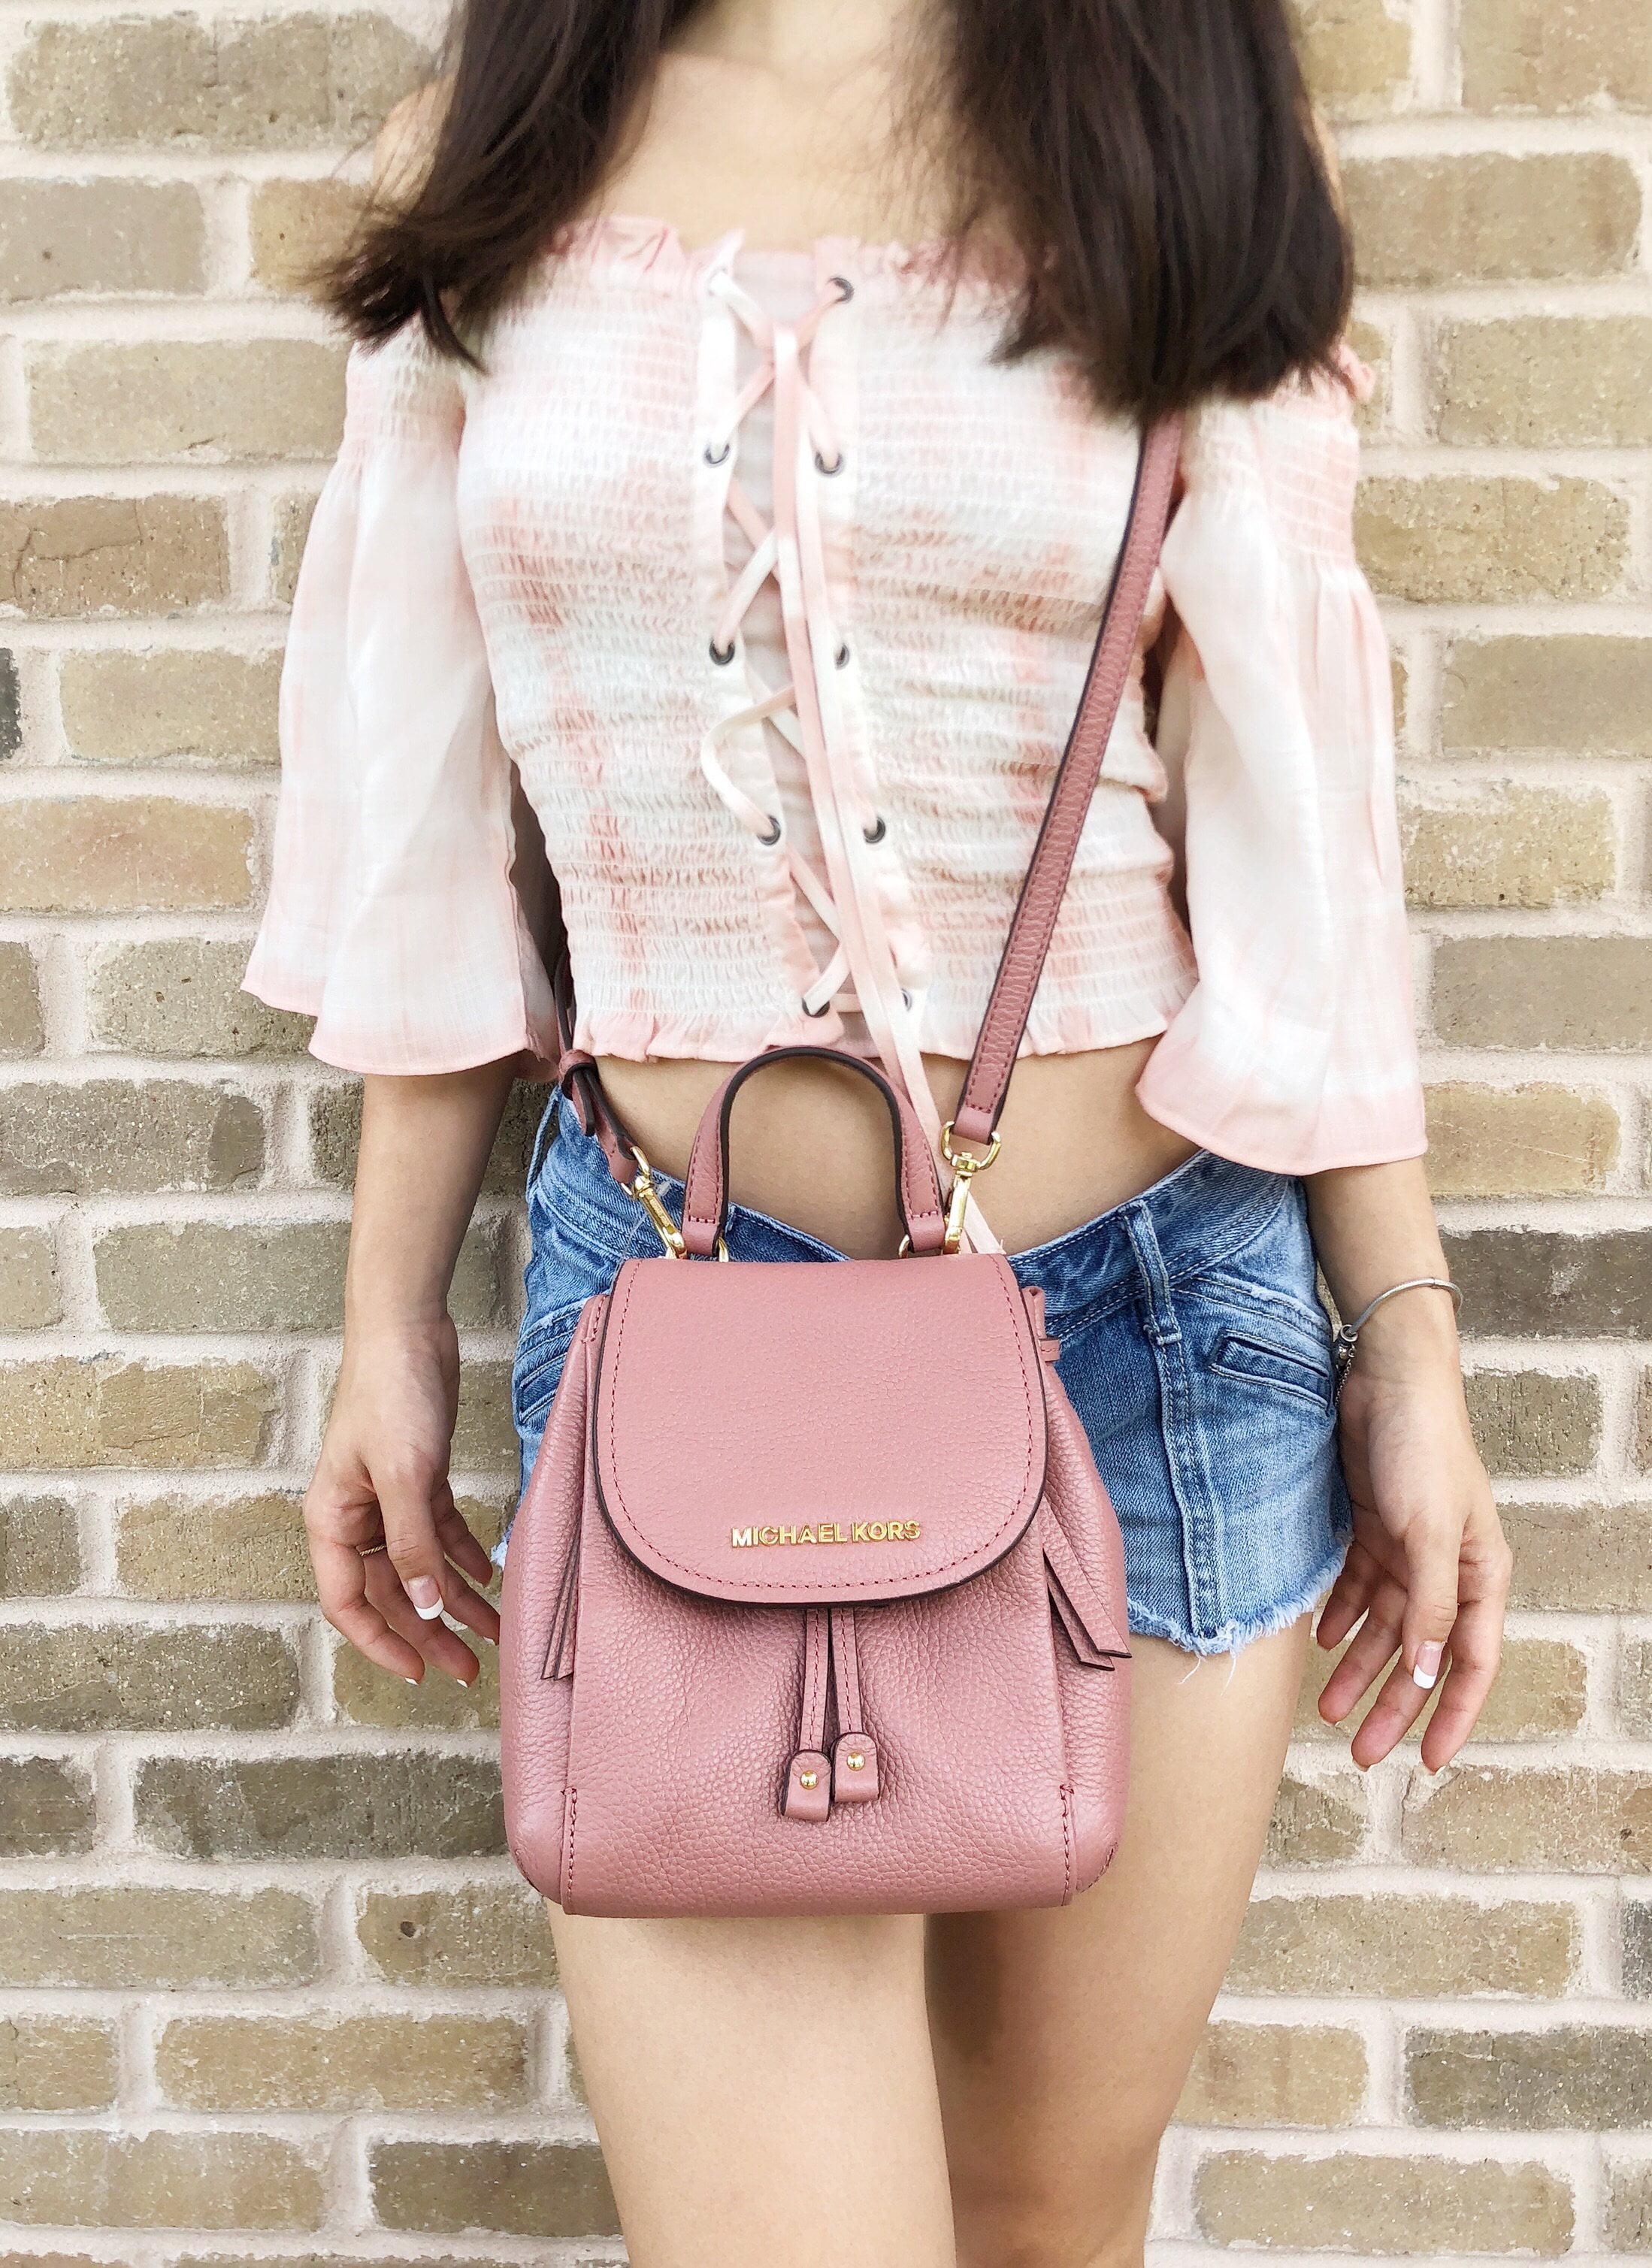 da58b7950eb07 Michael Kors - Michael Kors Mini Riley Small Crossbody Rose Pink Drawstring  Backpack Style - Walmart.com